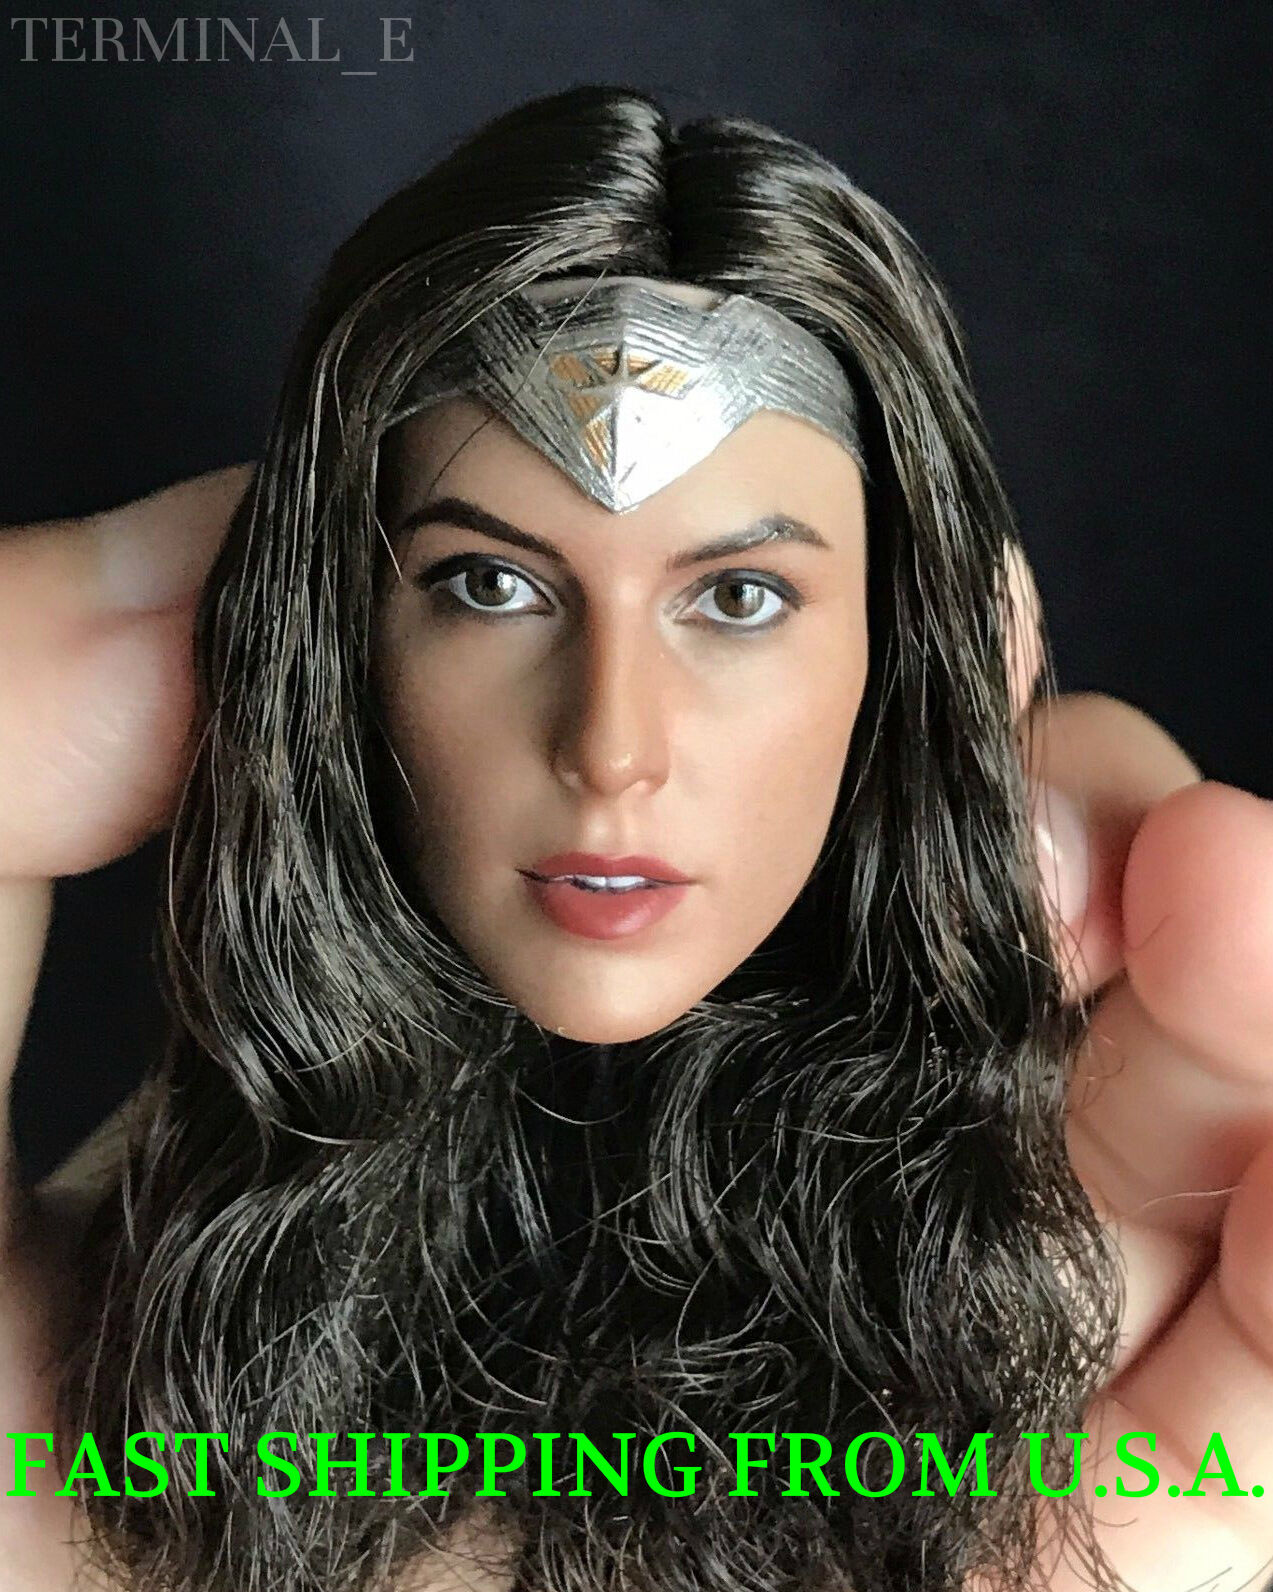 1 6 Gal Gadot WONDER WOMAN Head Sculpt For PHICEN Hot Toys Female Figure ❶USA❶